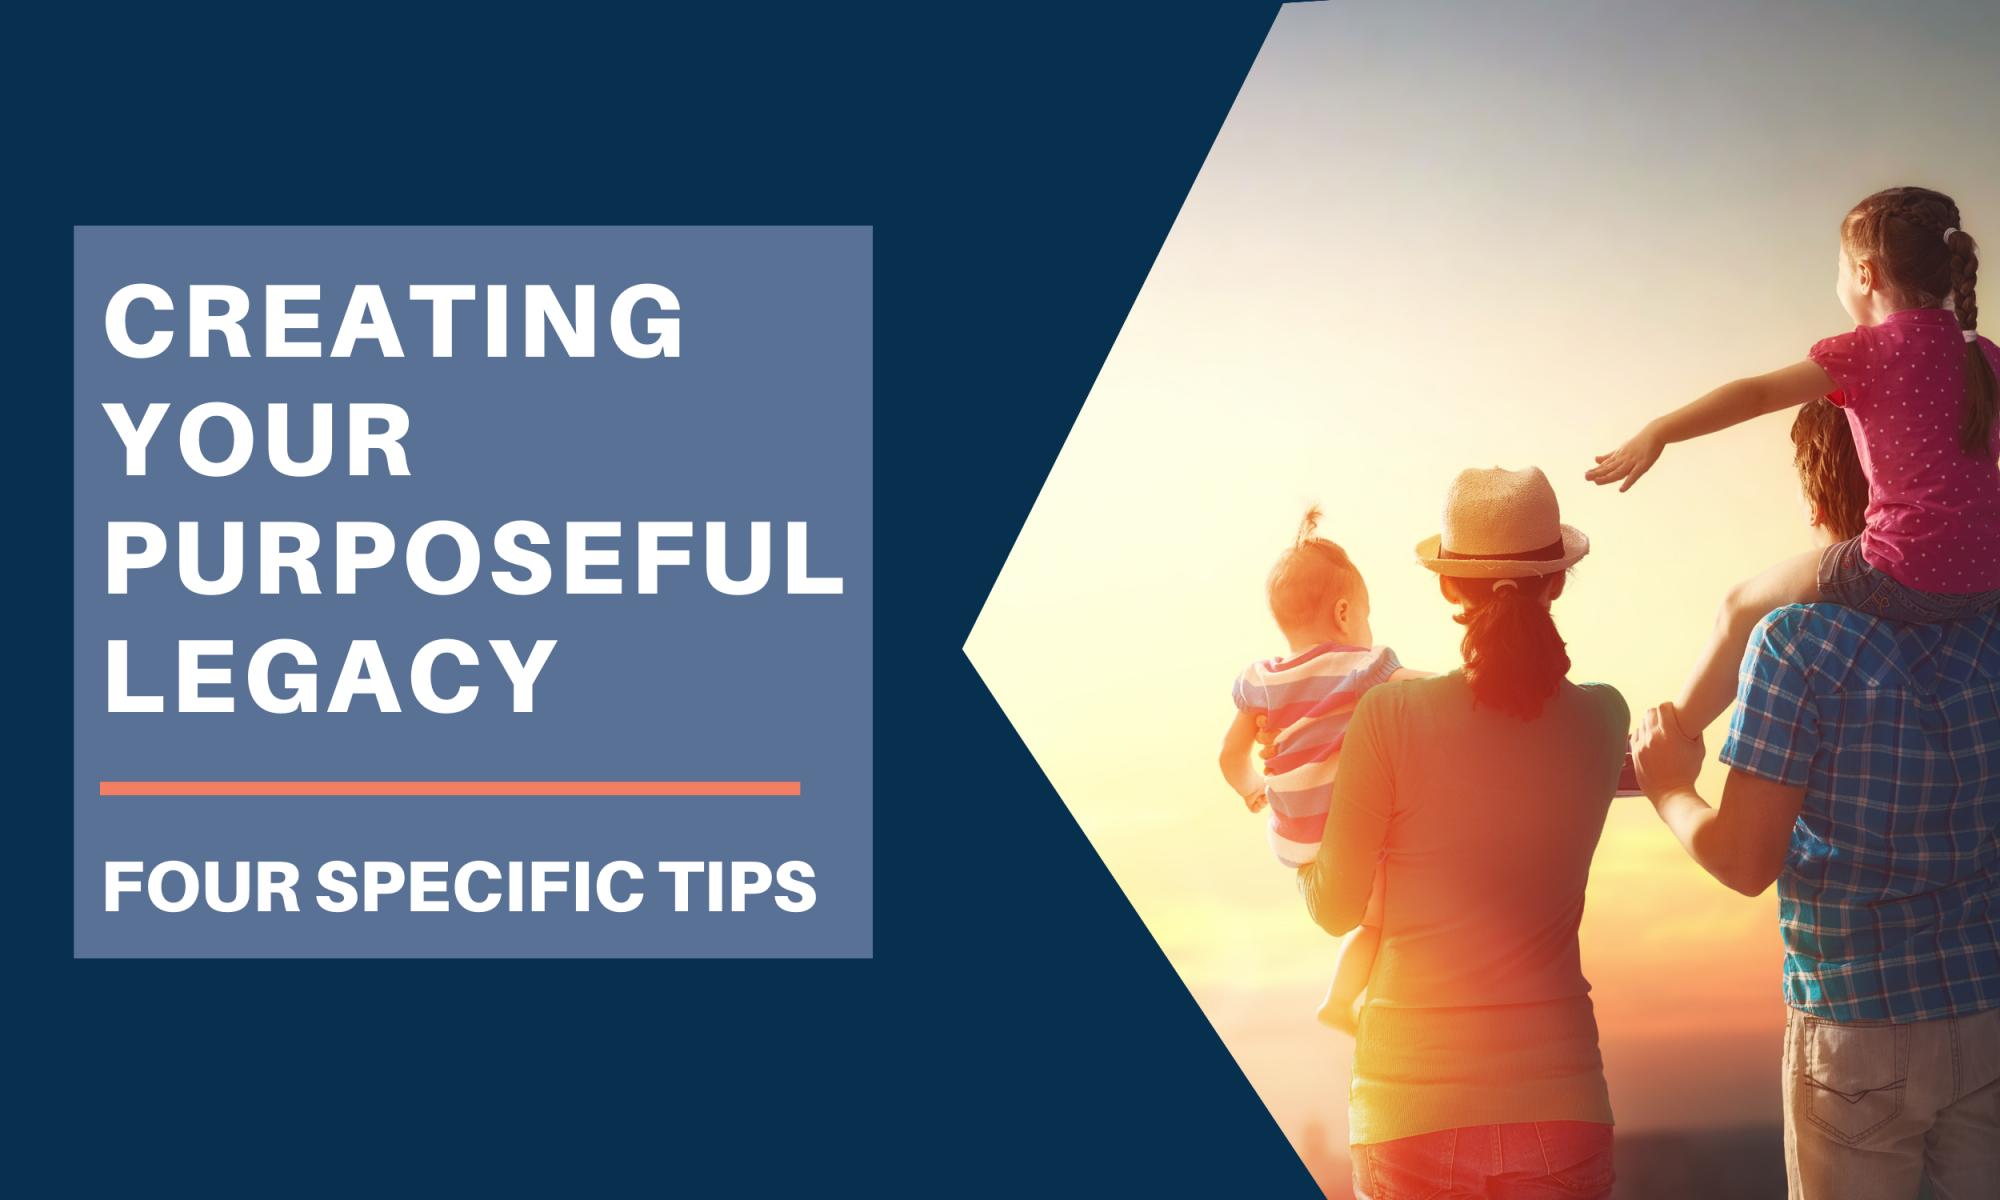 Creating Your Puirposeful Legacy